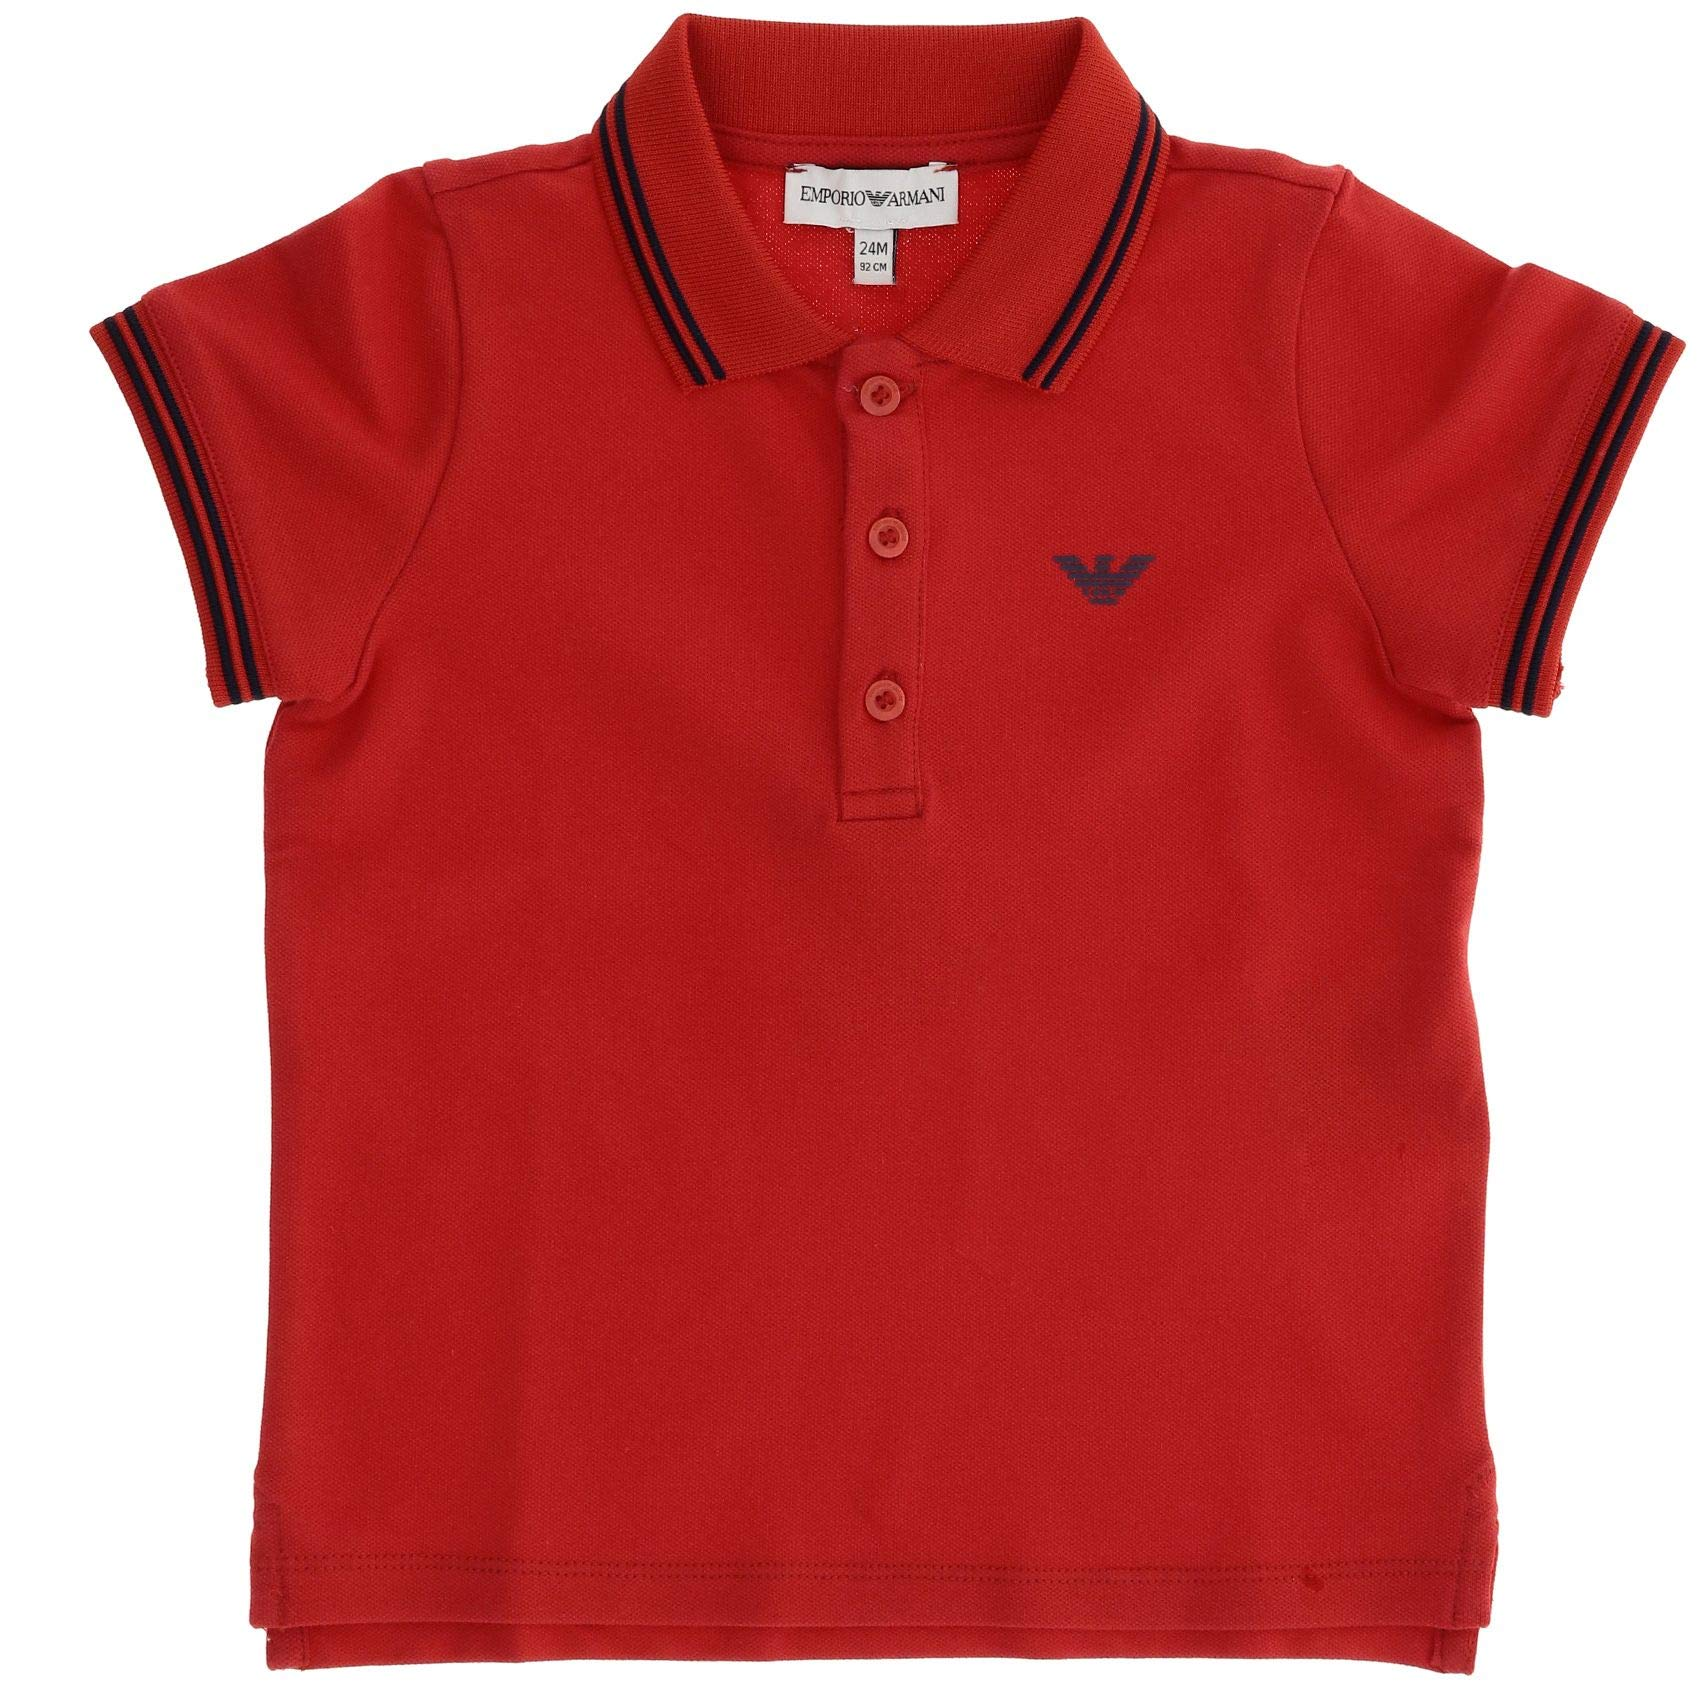 Emporio Armani Luxury Fashion Baby-Boys Polo Shirt Summer Red by Emporio Armani